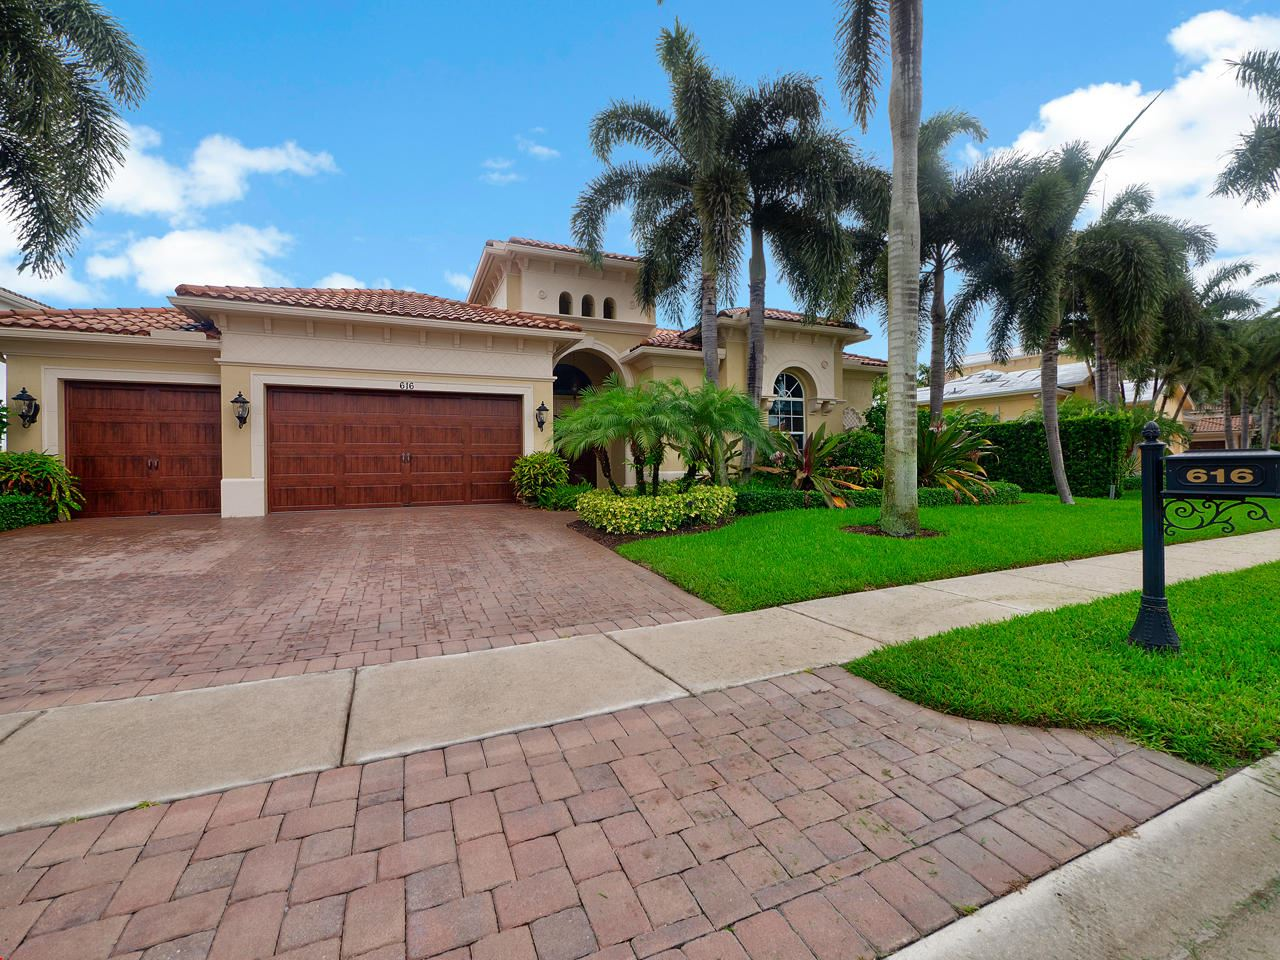 Photo of 616 Hermitage Circle, Palm Beach Gardens, FL 33410 (MLS # RX-10703885)